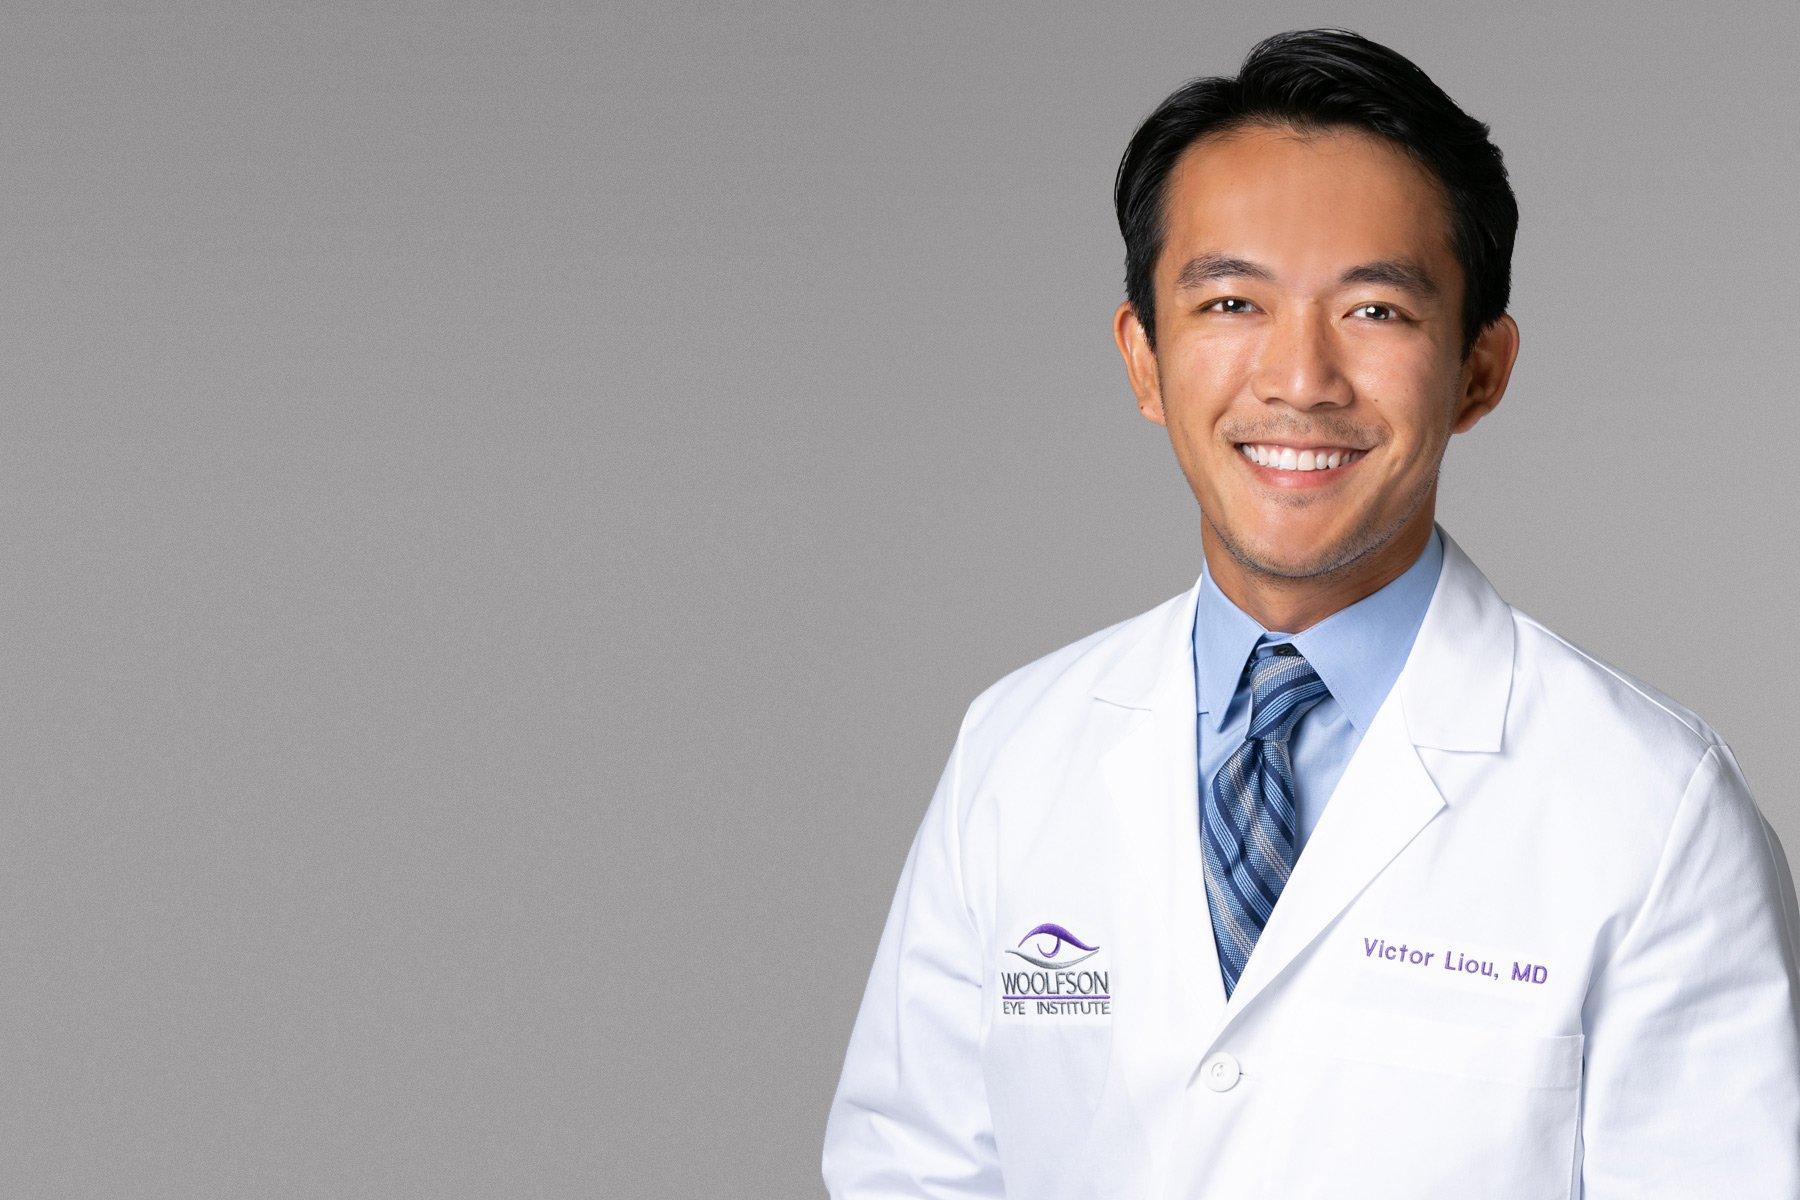 Victor Liou, MD